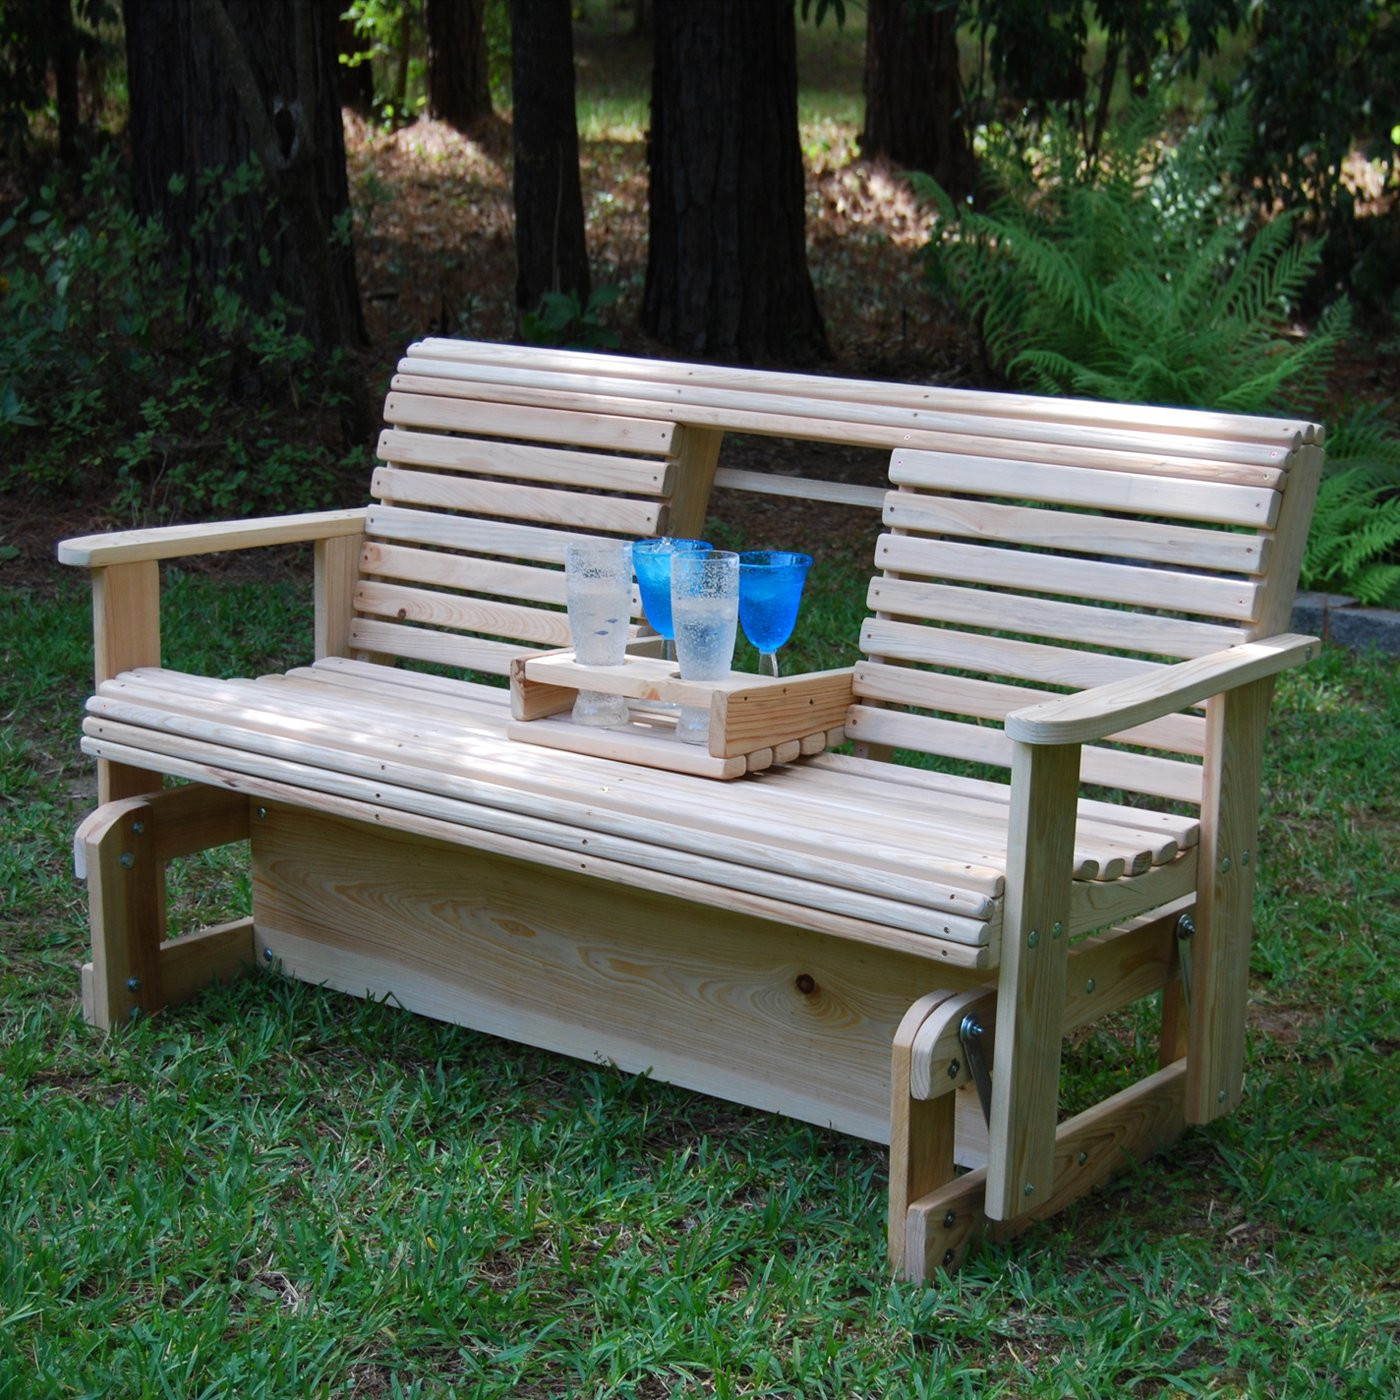 Best ideas about DIY Glider Bench . Save or Pin 20 amazing diy garden furniture ideas Now.